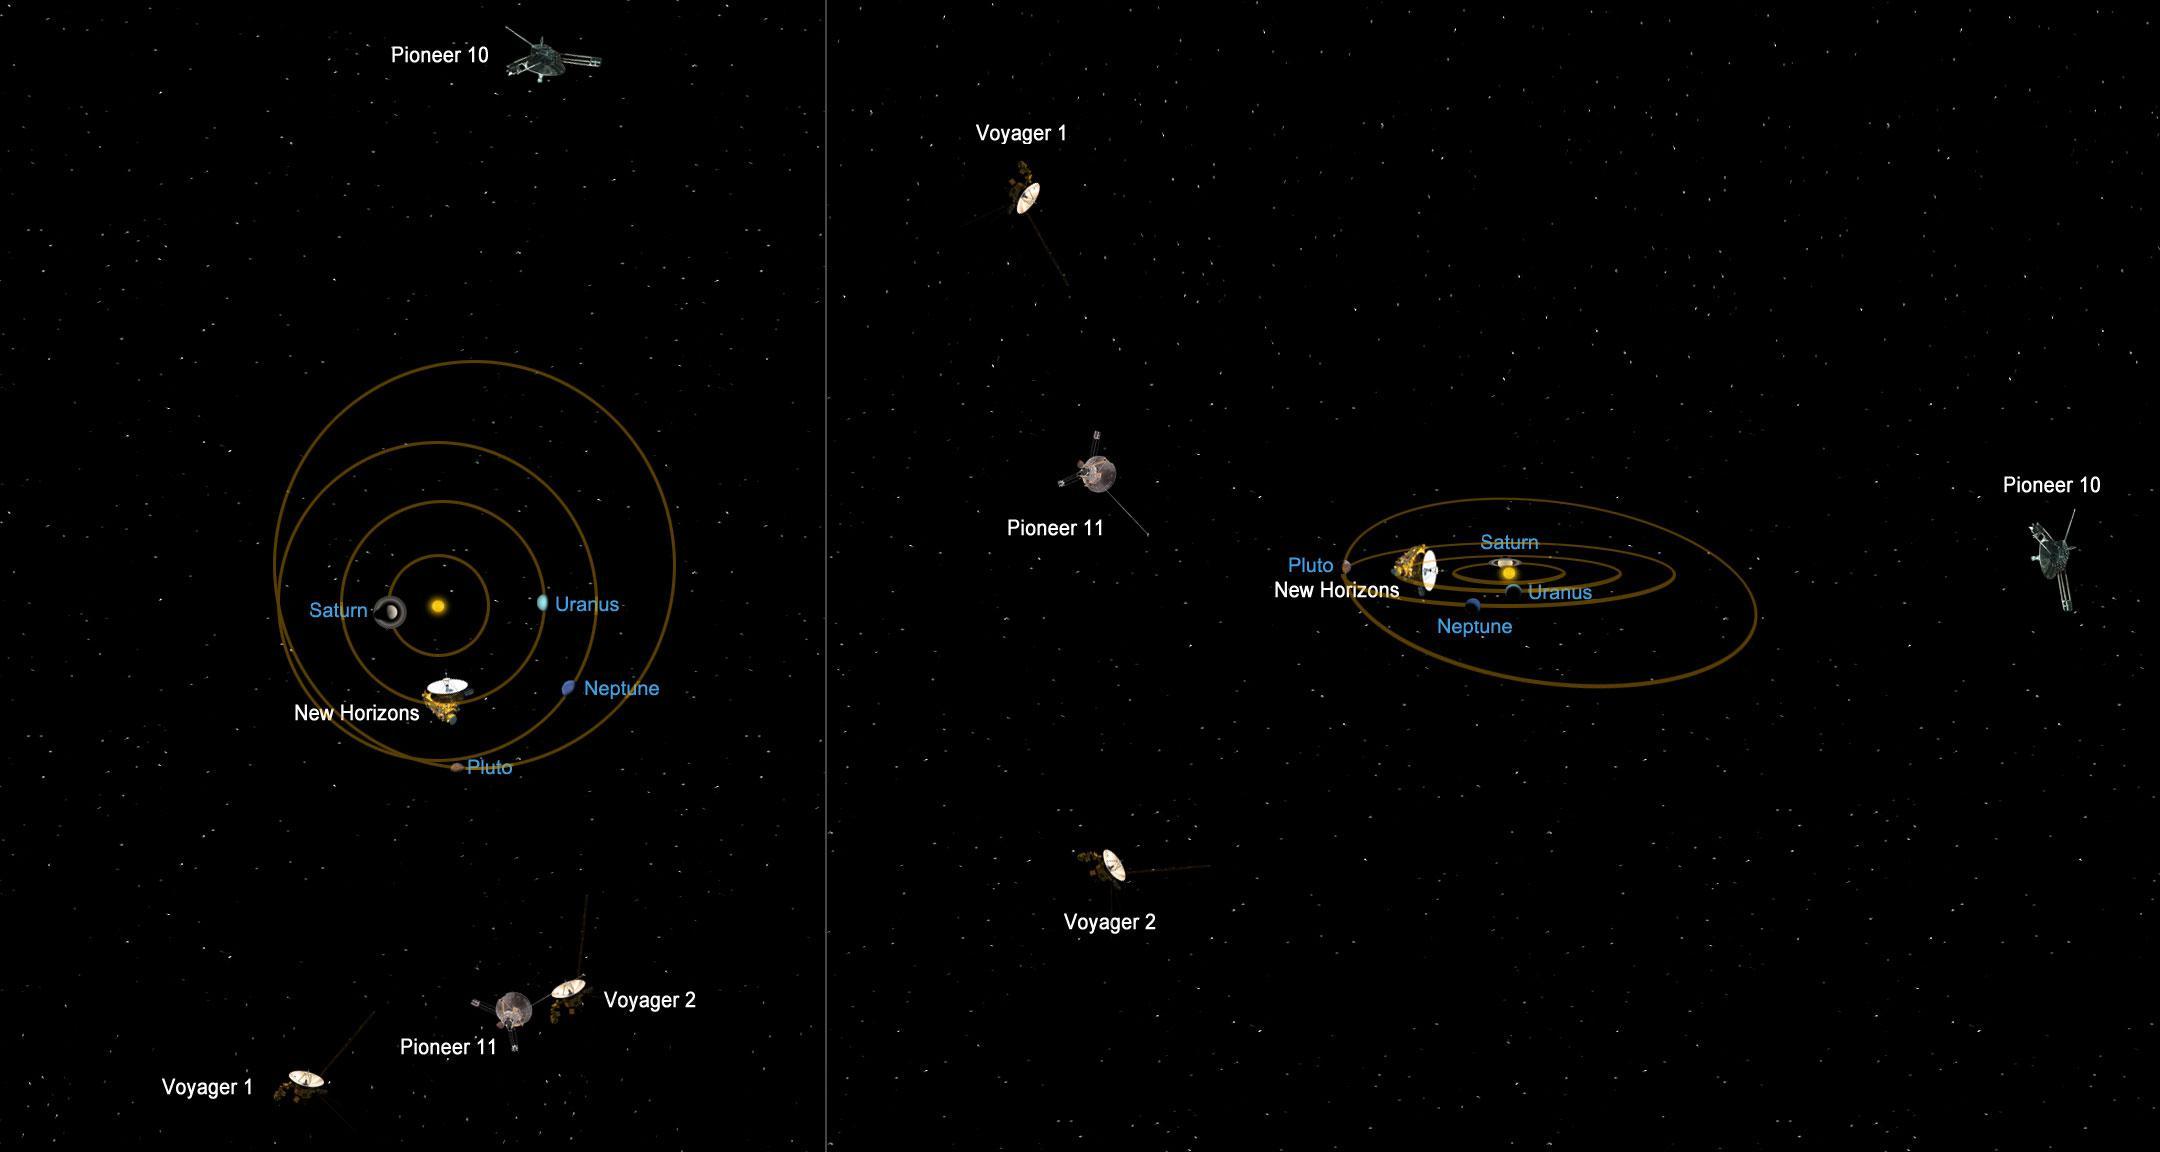 NASA - Relative Positions of Distant Spacecraft